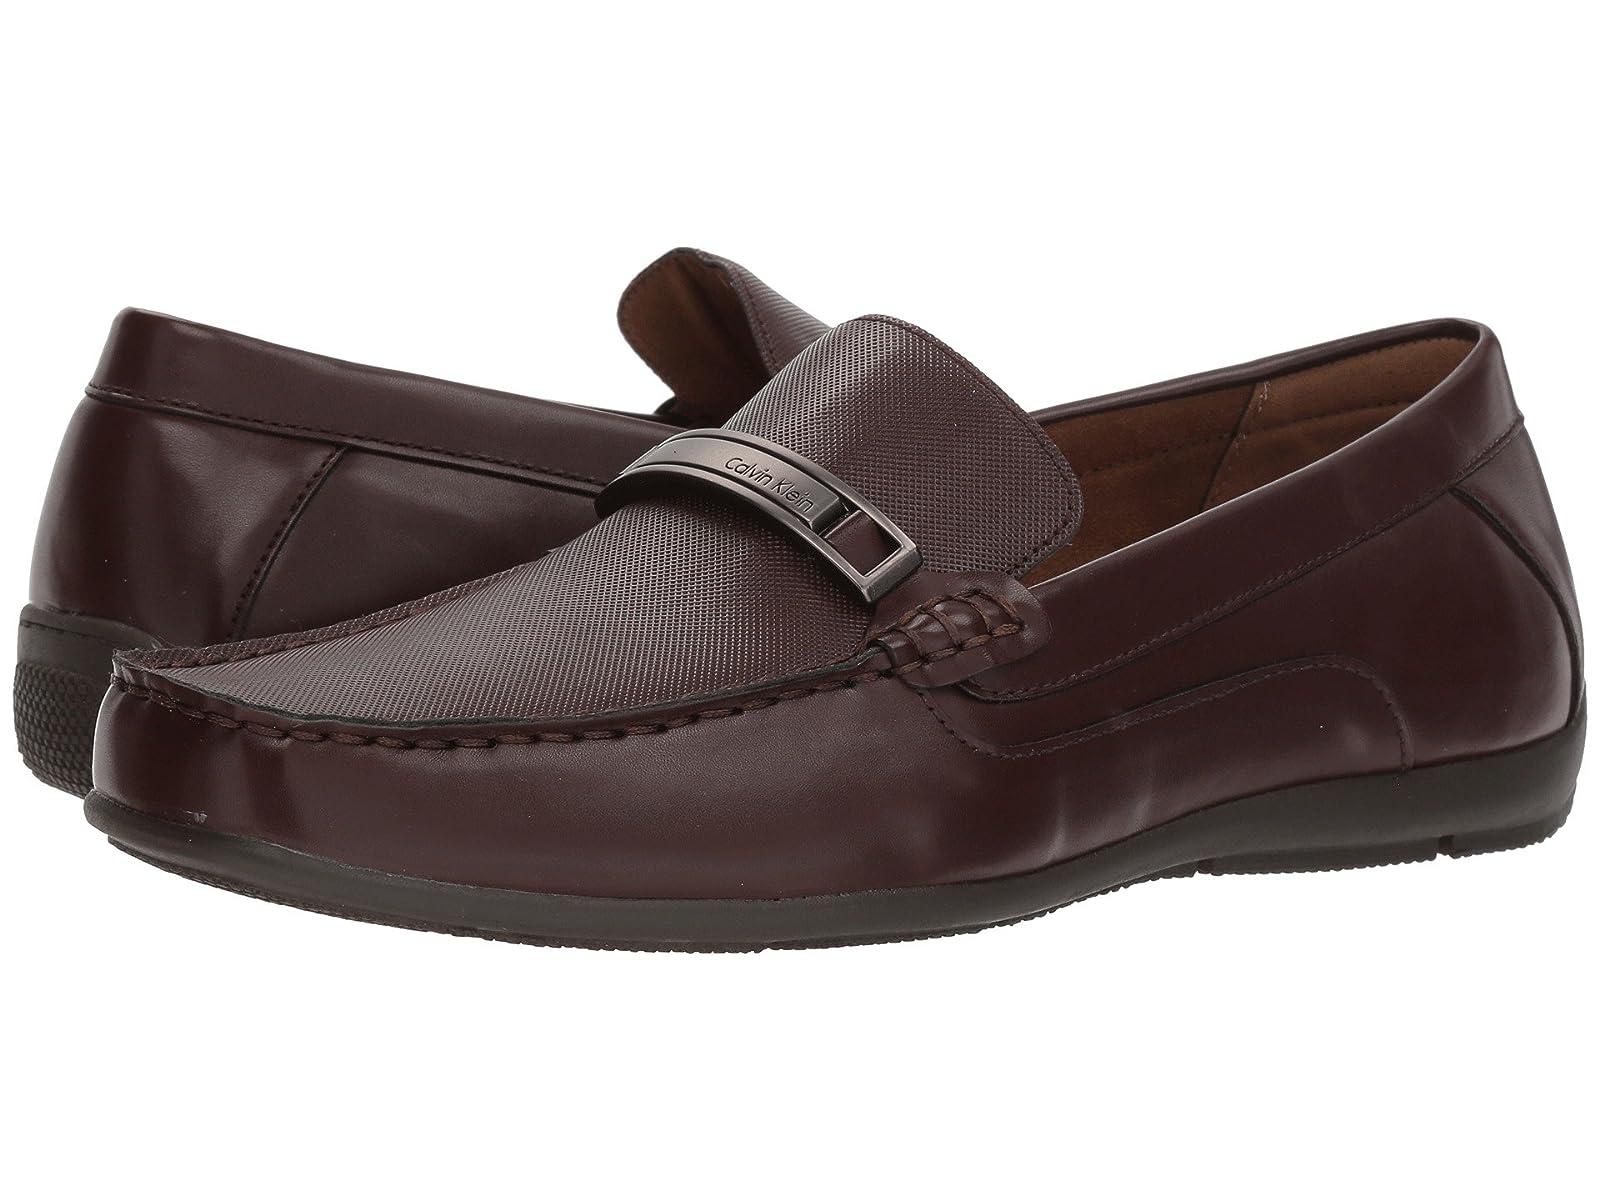 Calvin Klein MarcellusCheap and distinctive eye-catching shoes